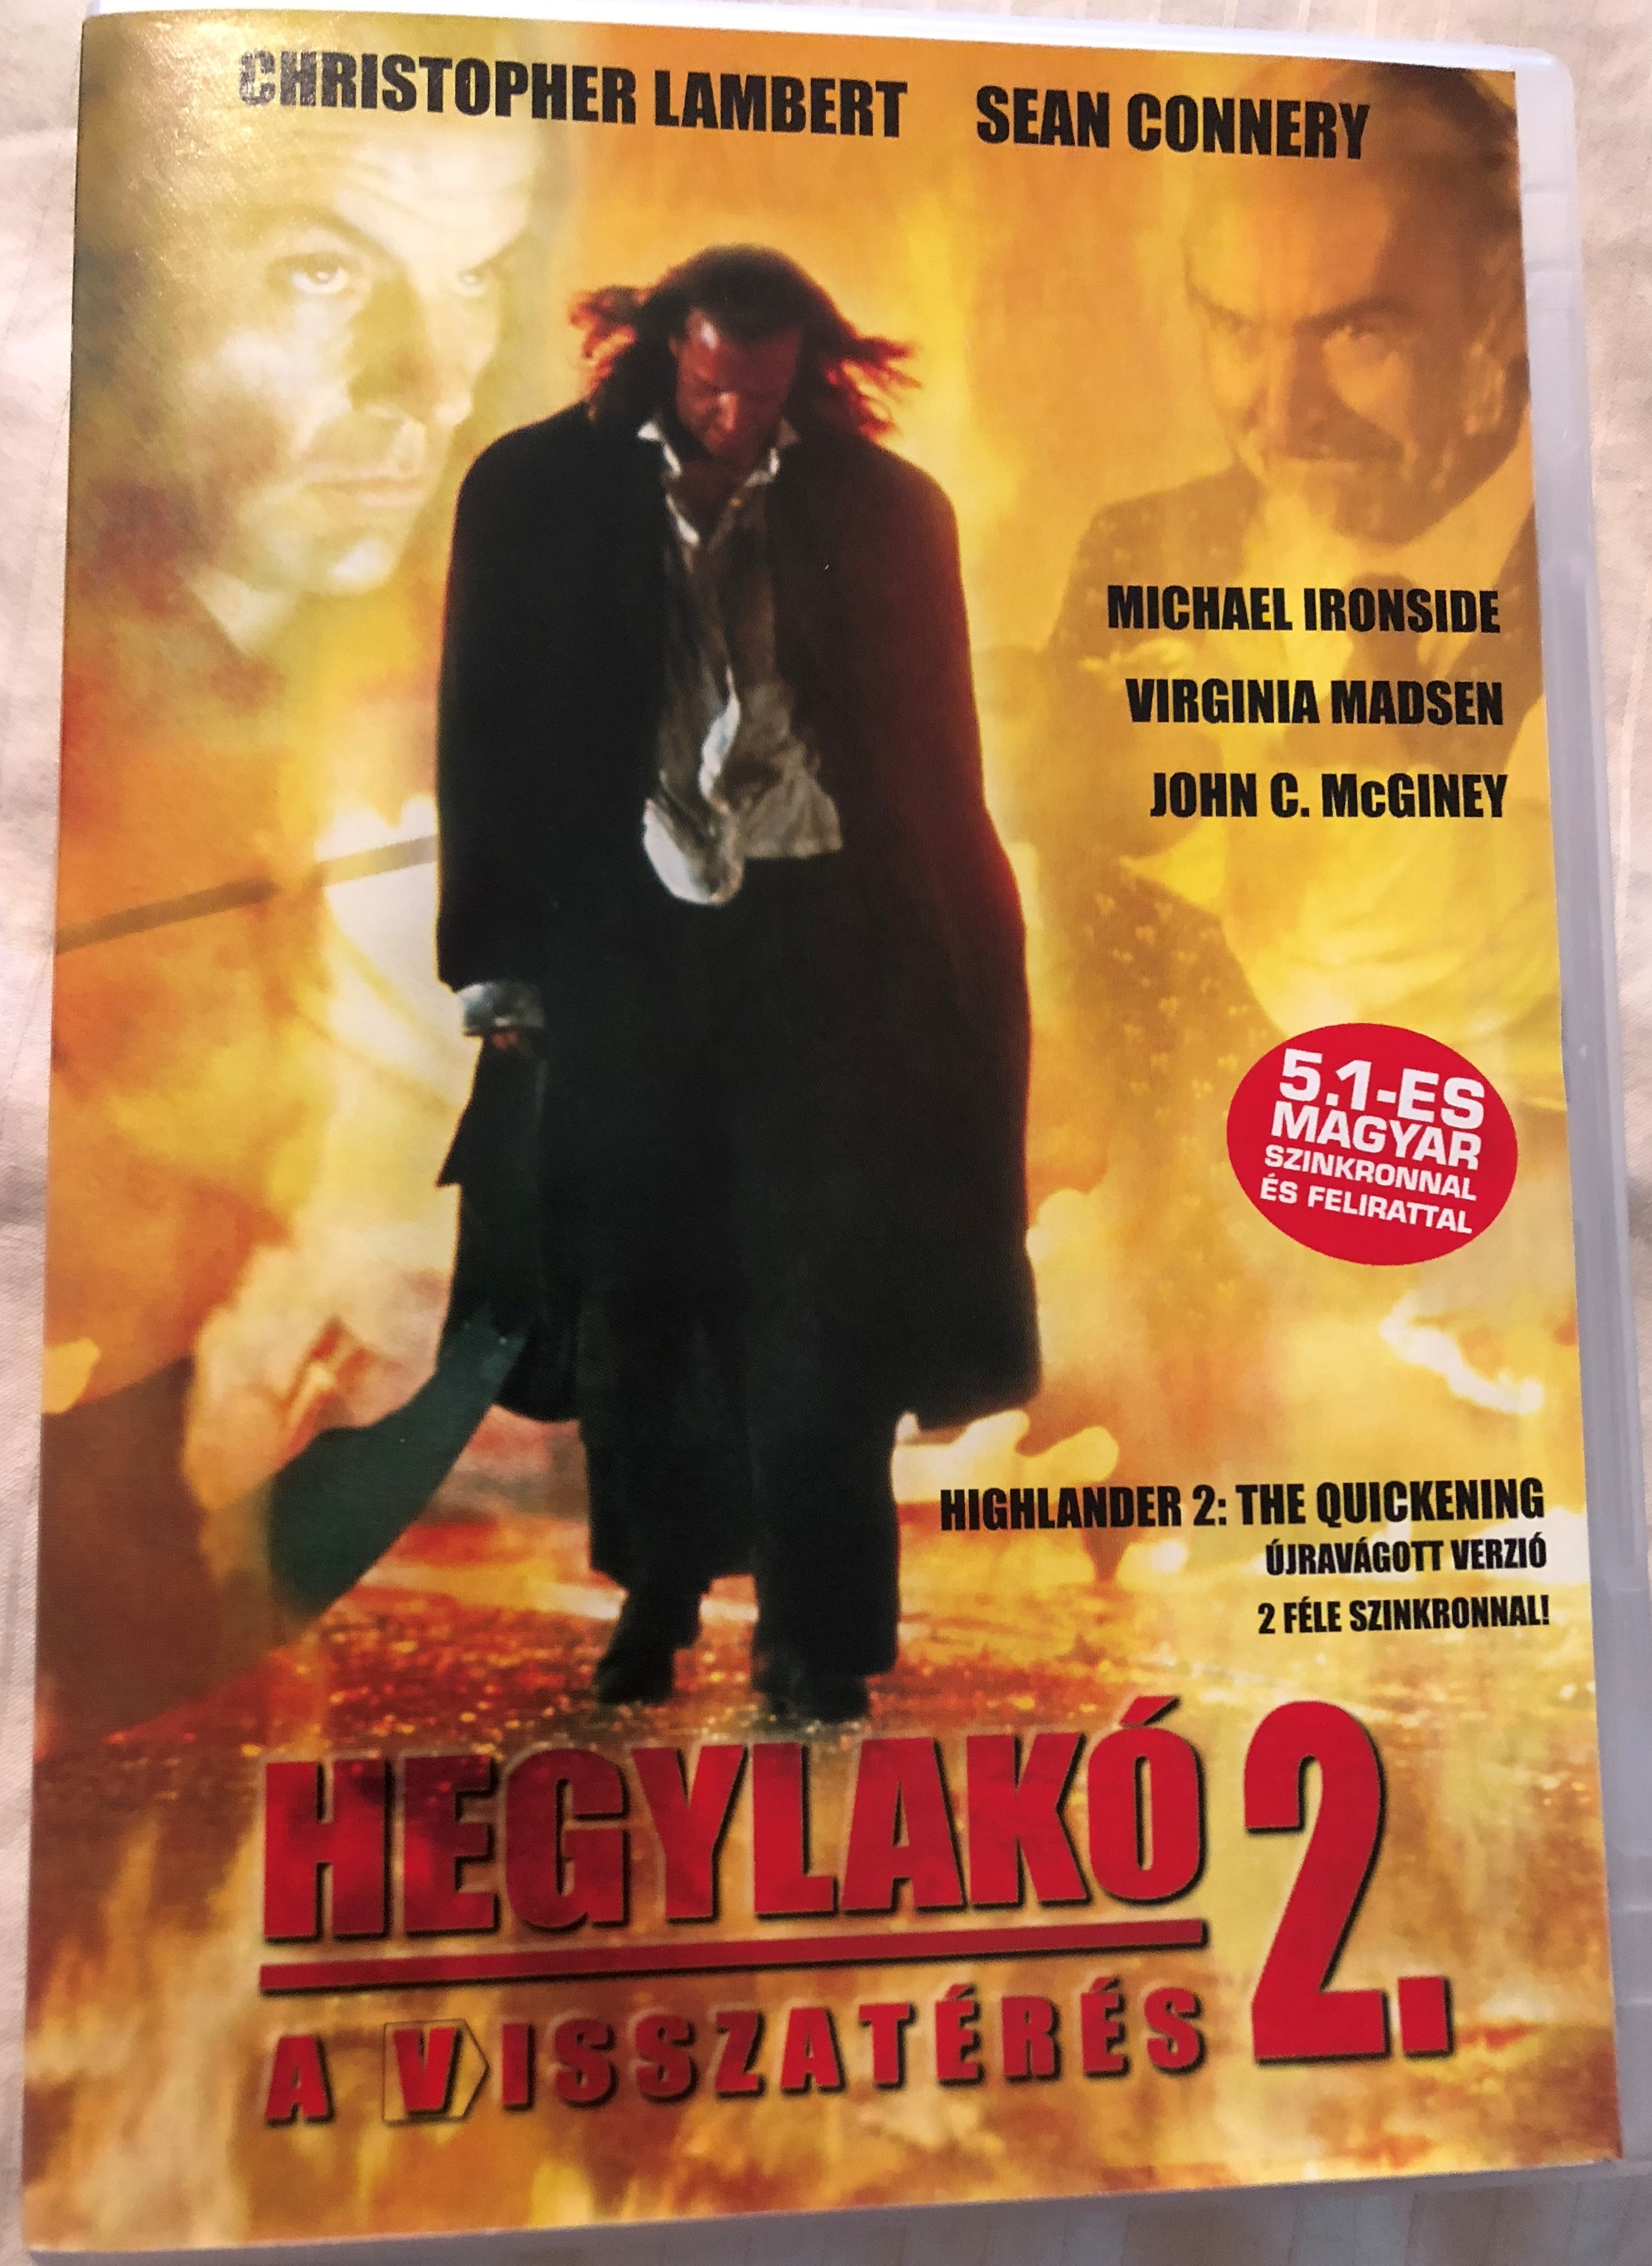 hegylak-2-a-visszat-r-s-dvd-1991-highlander-2-the-quickening-directed-by-russell-mulcahy-starring-sir-sean-connery-christopher-lambert-michael-ironside-virginia-madsen-john-c.-mcginey-1-.jpg